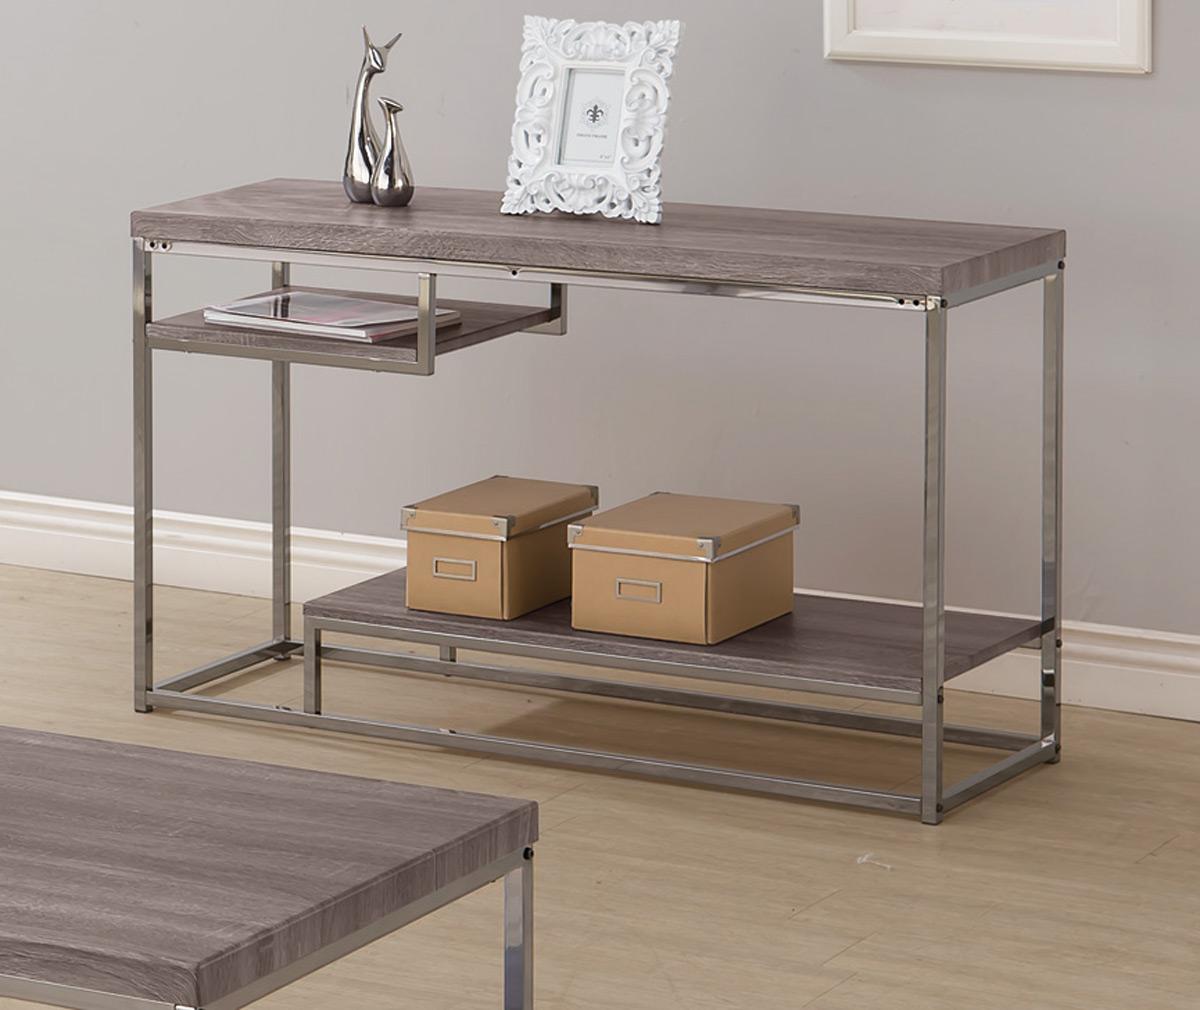 Coaster 703729 Sofa Table - Weathered Grey/Black Nickel